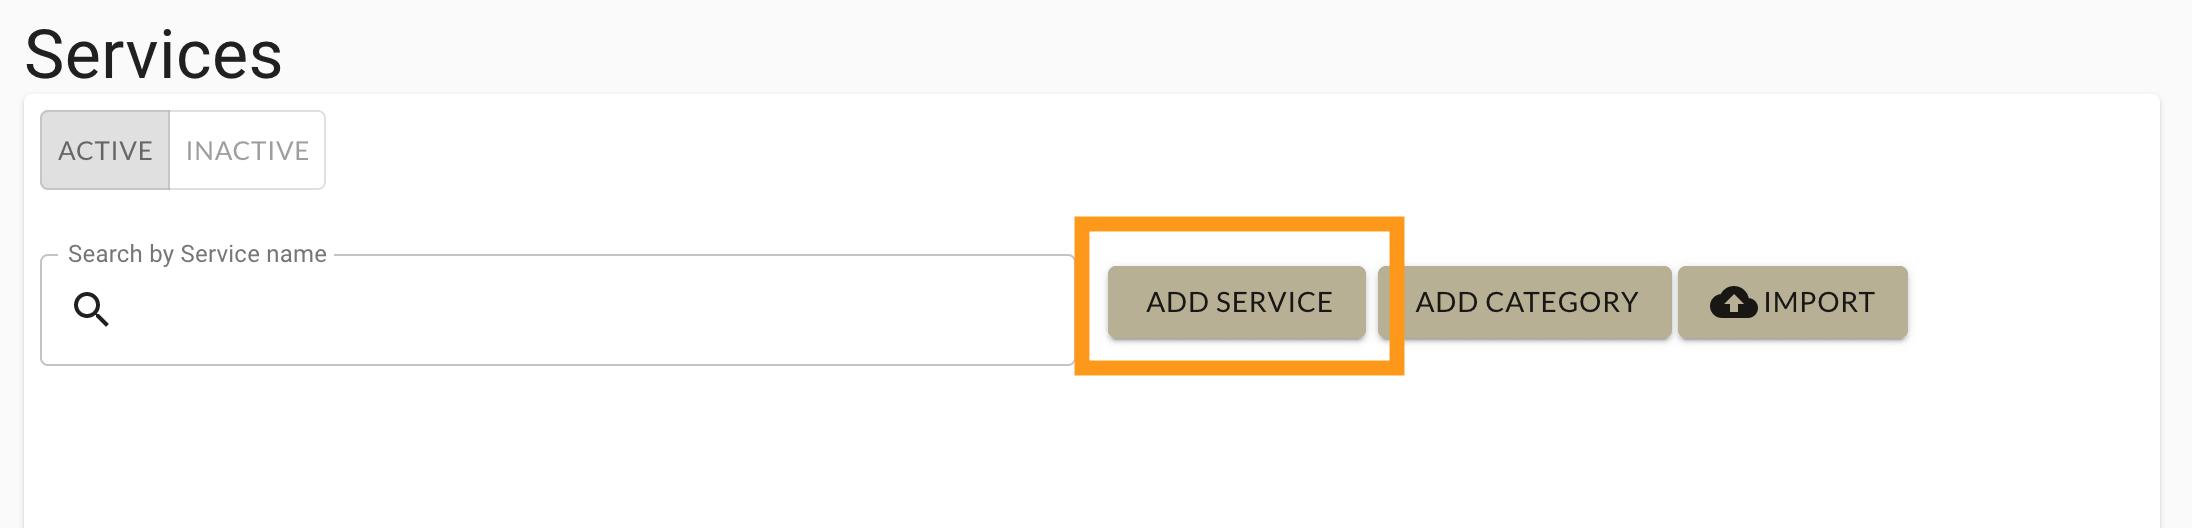 Select add service